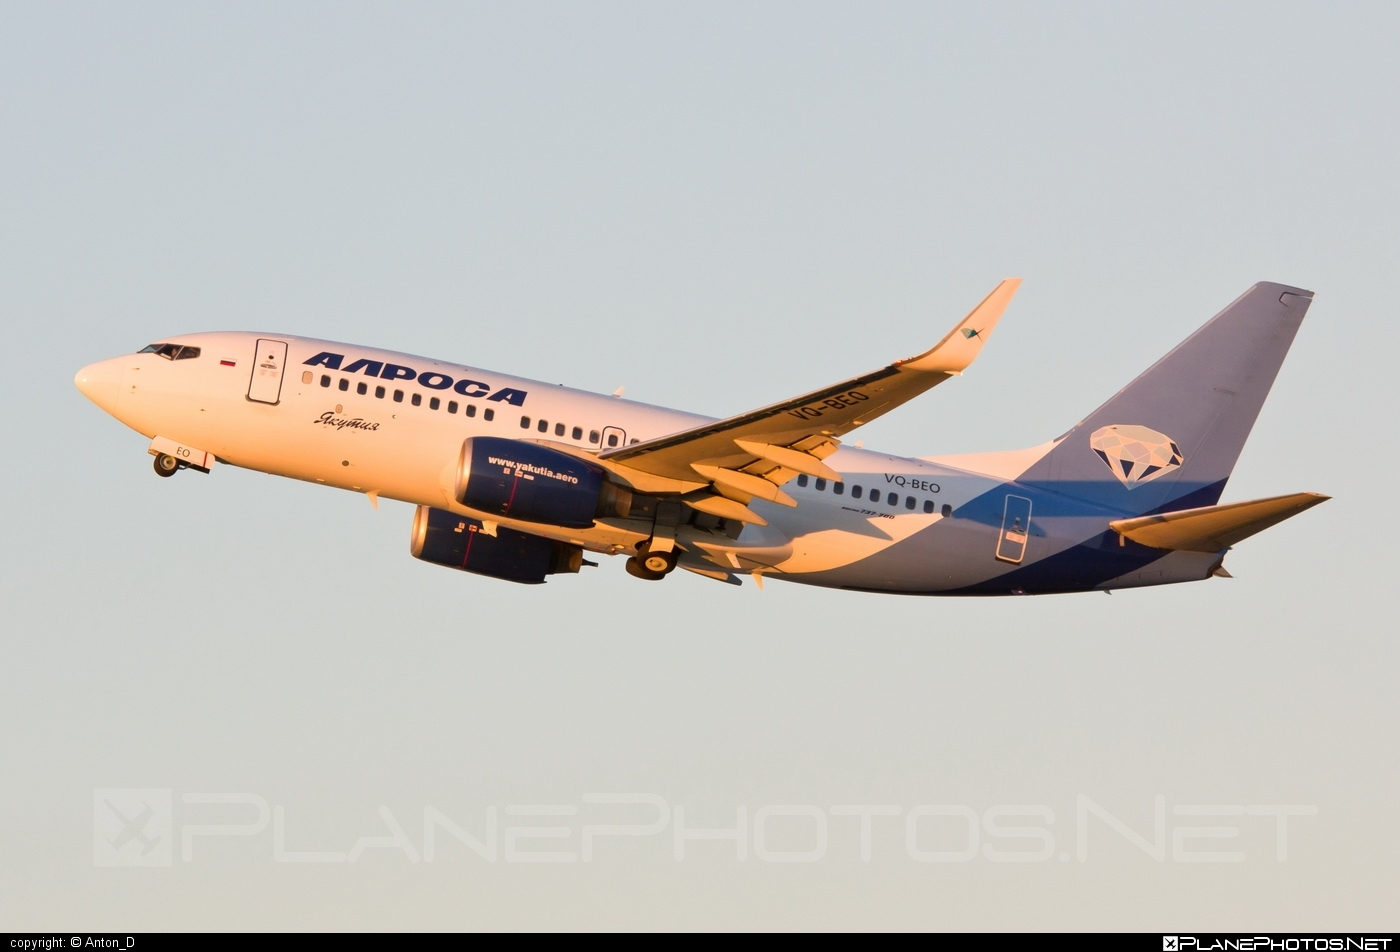 Boeing 737-700 - VQ-BEO operated by Alrosa-Avia #b737 #b737nextgen #b737ng #boeing #boeing737